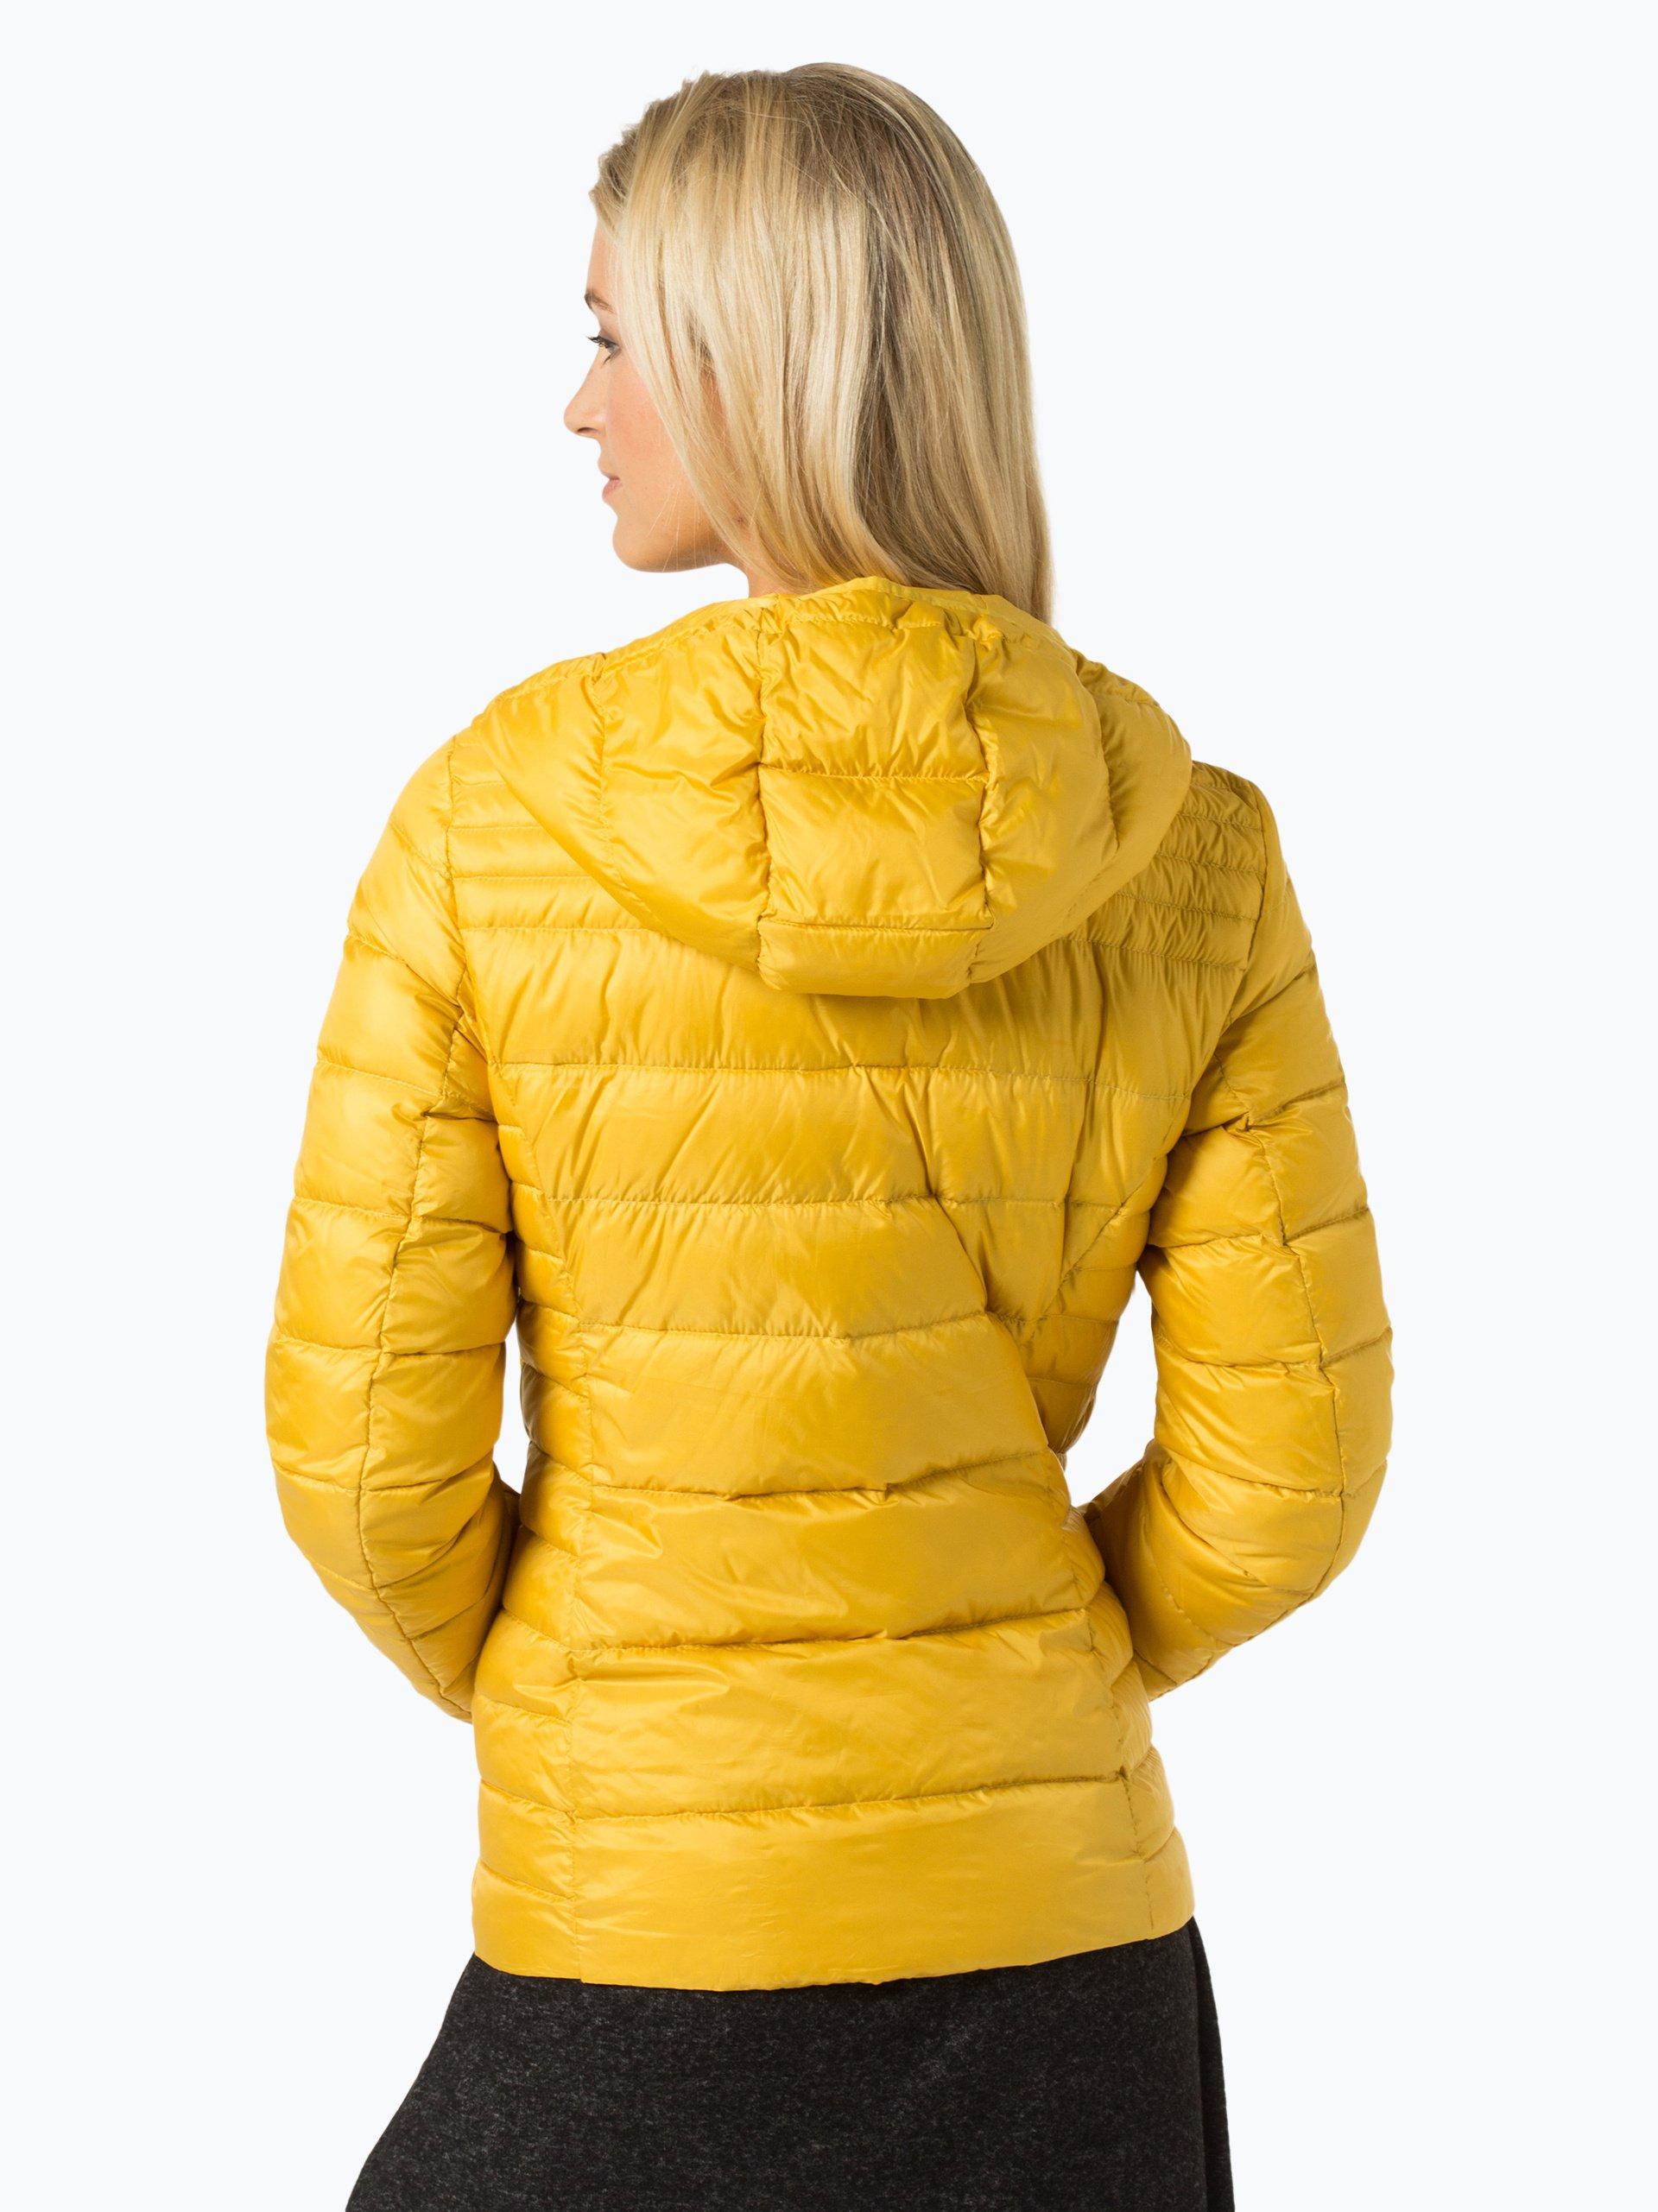 esprit casual damen daunenjacke gelb uni online kaufen. Black Bedroom Furniture Sets. Home Design Ideas